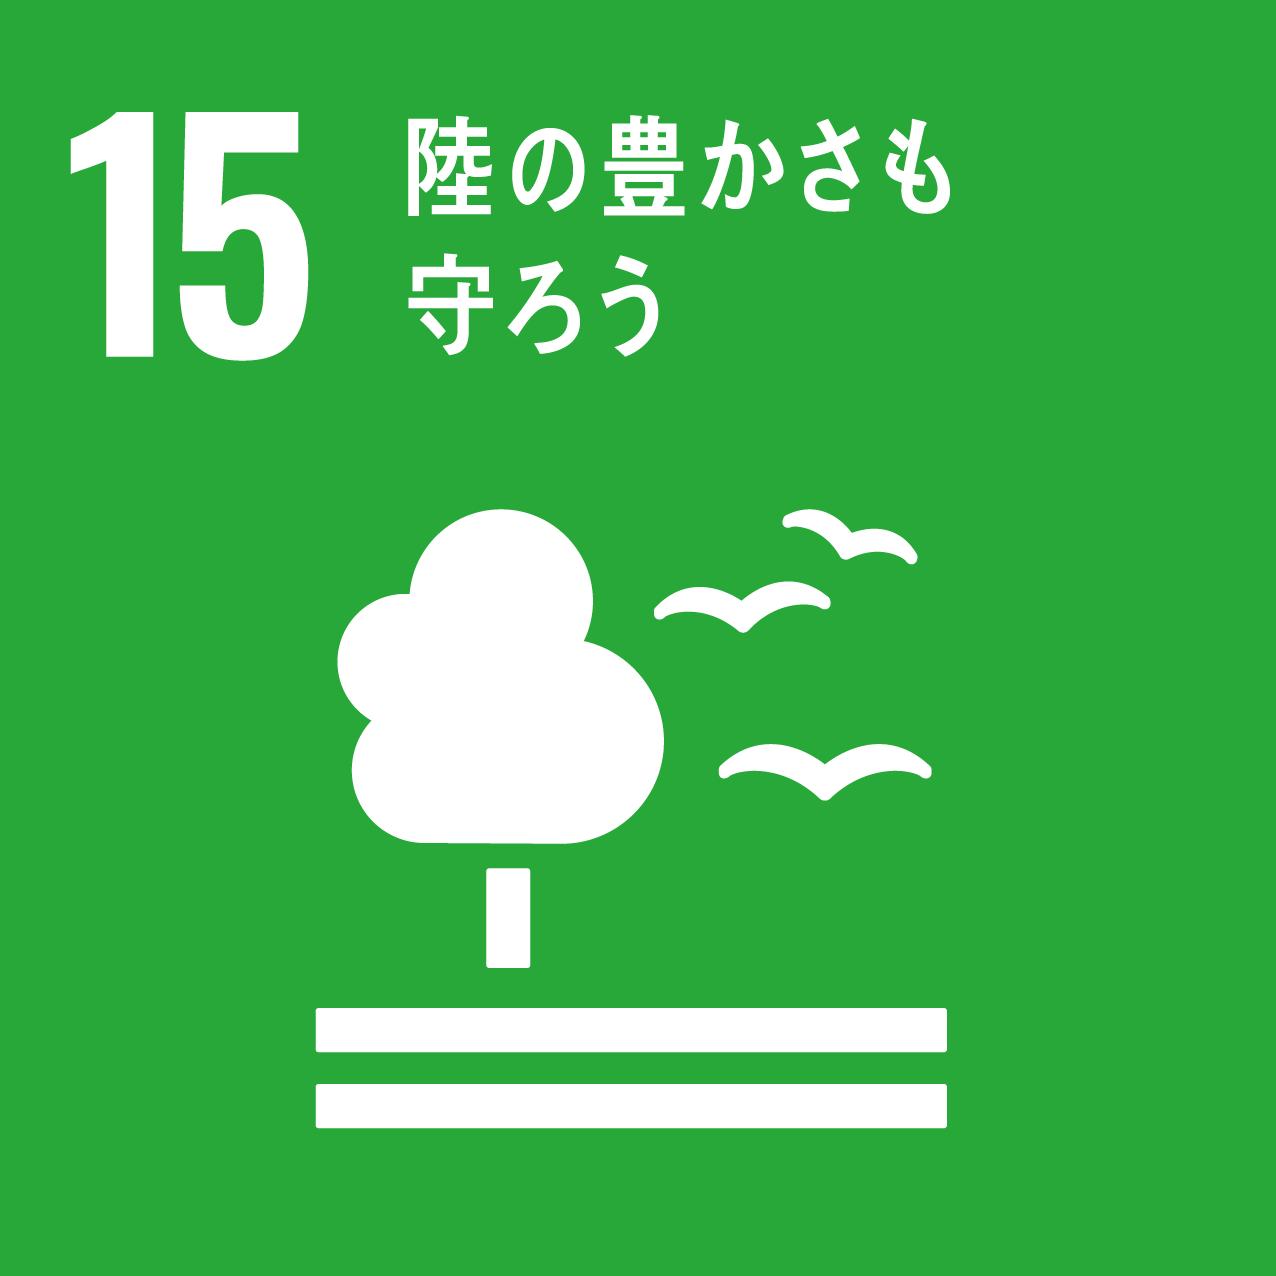 SDGsの15つ目の目標